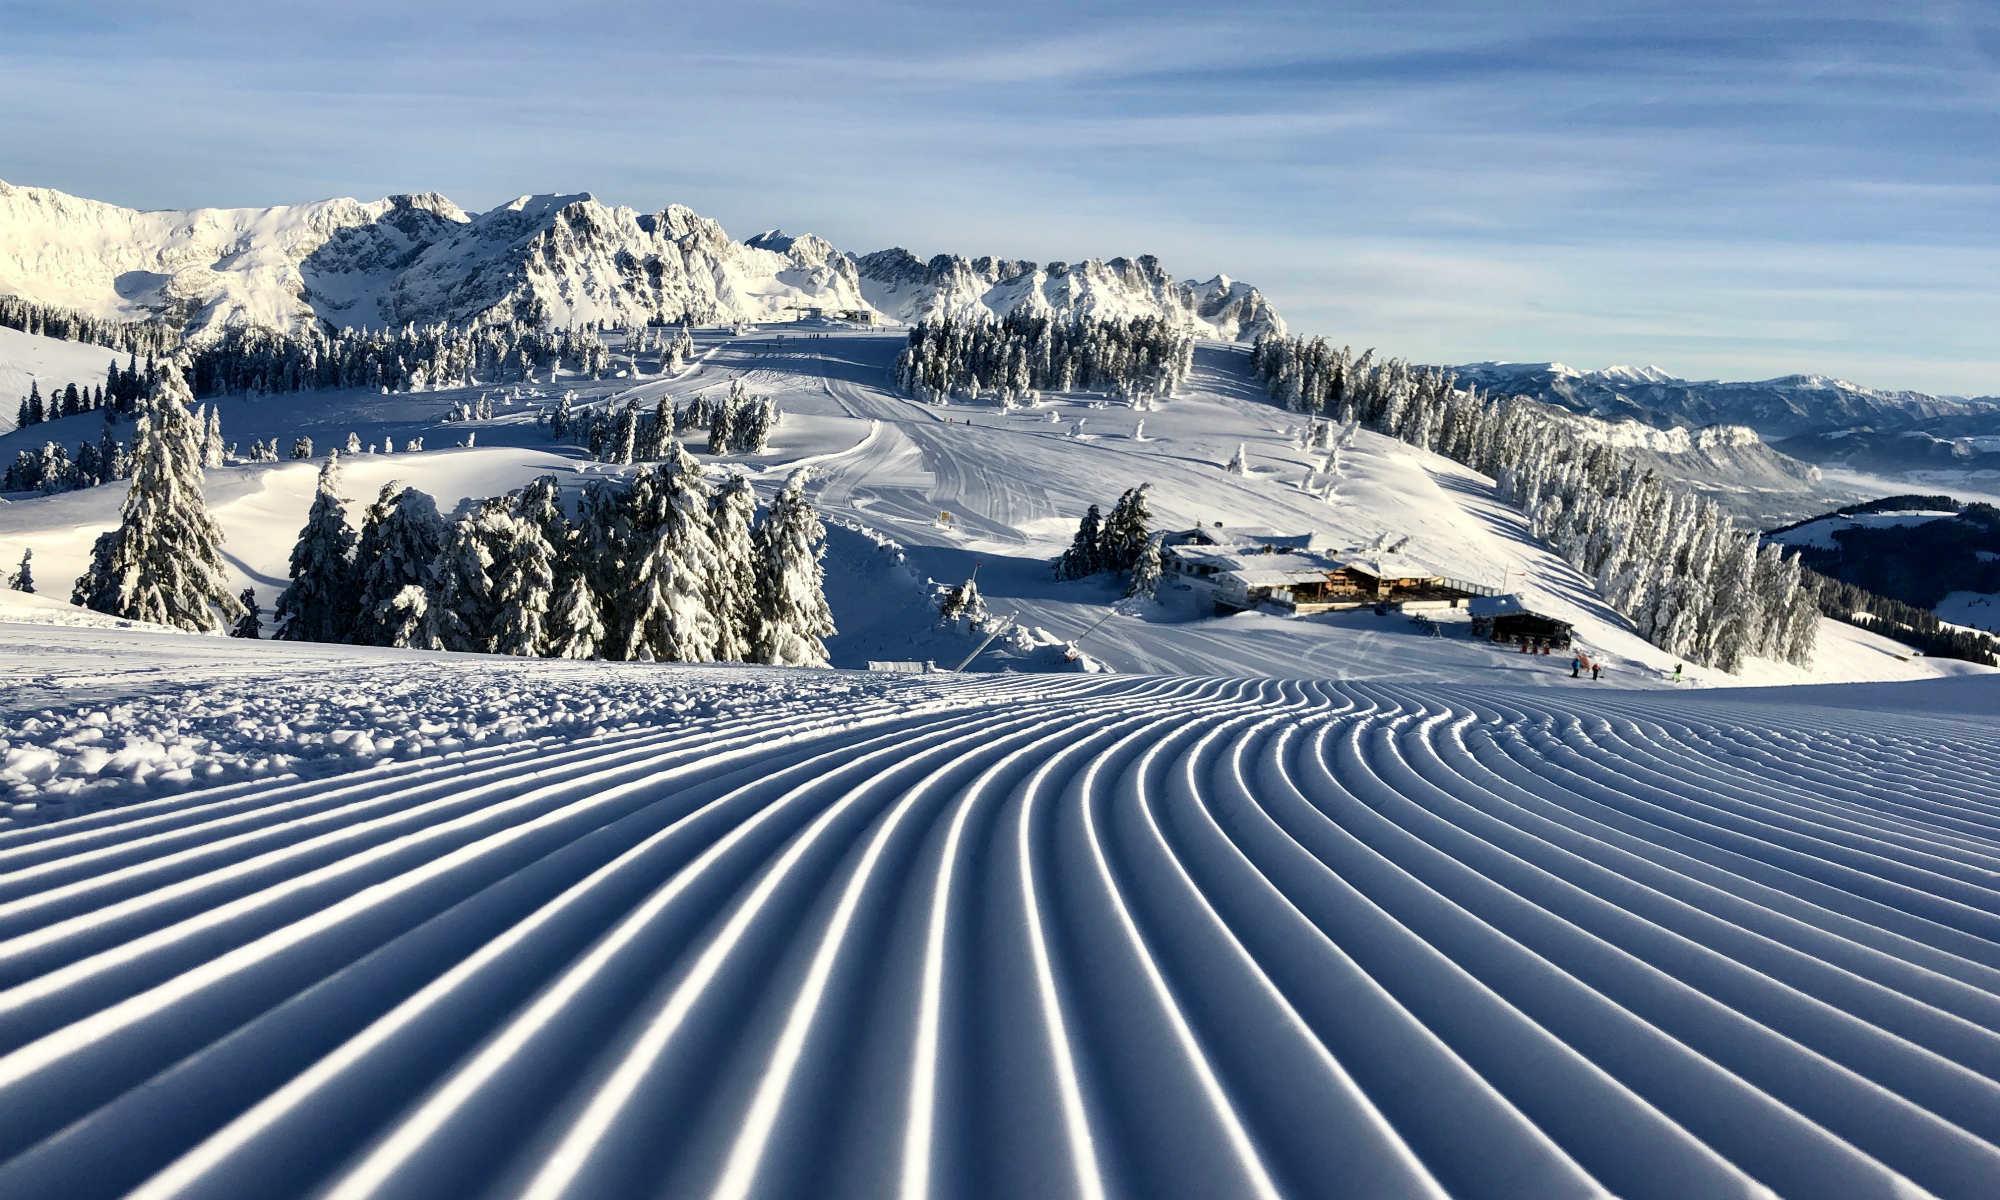 View over perfectly-groomed ski slopes at Söll ski resort.